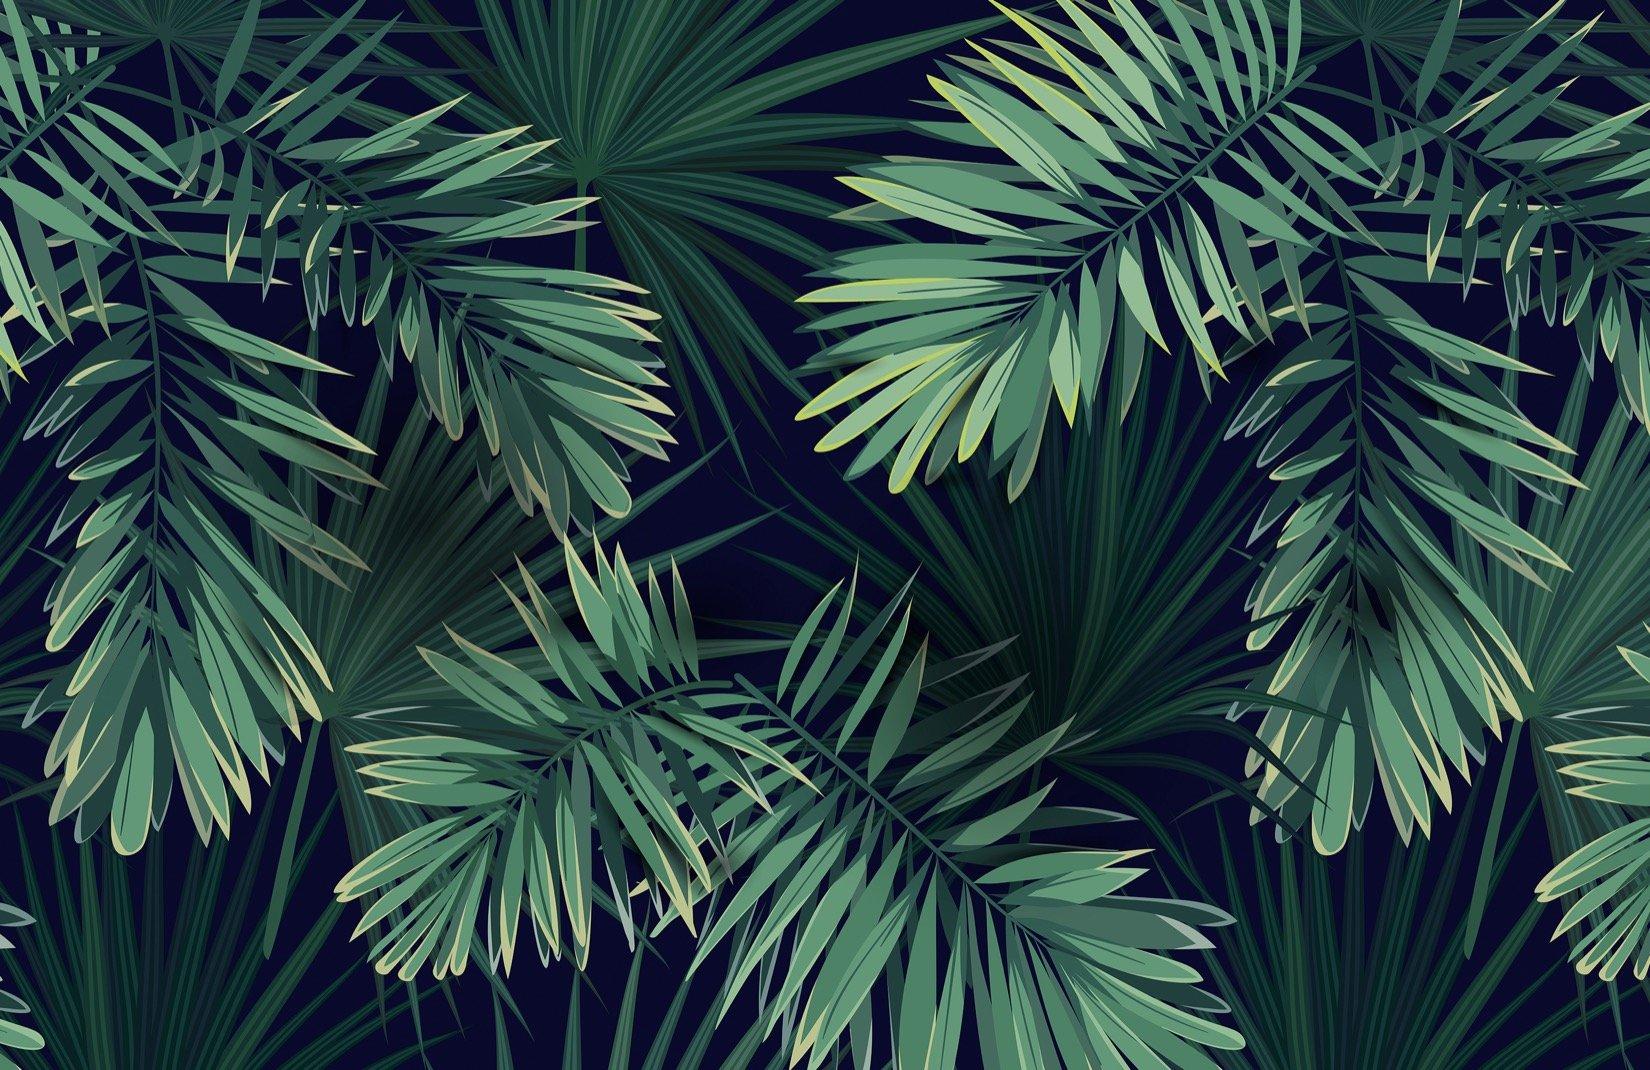 Tropical Green Plant Wallpaper Mural Murals Wallpaper 1650x1070